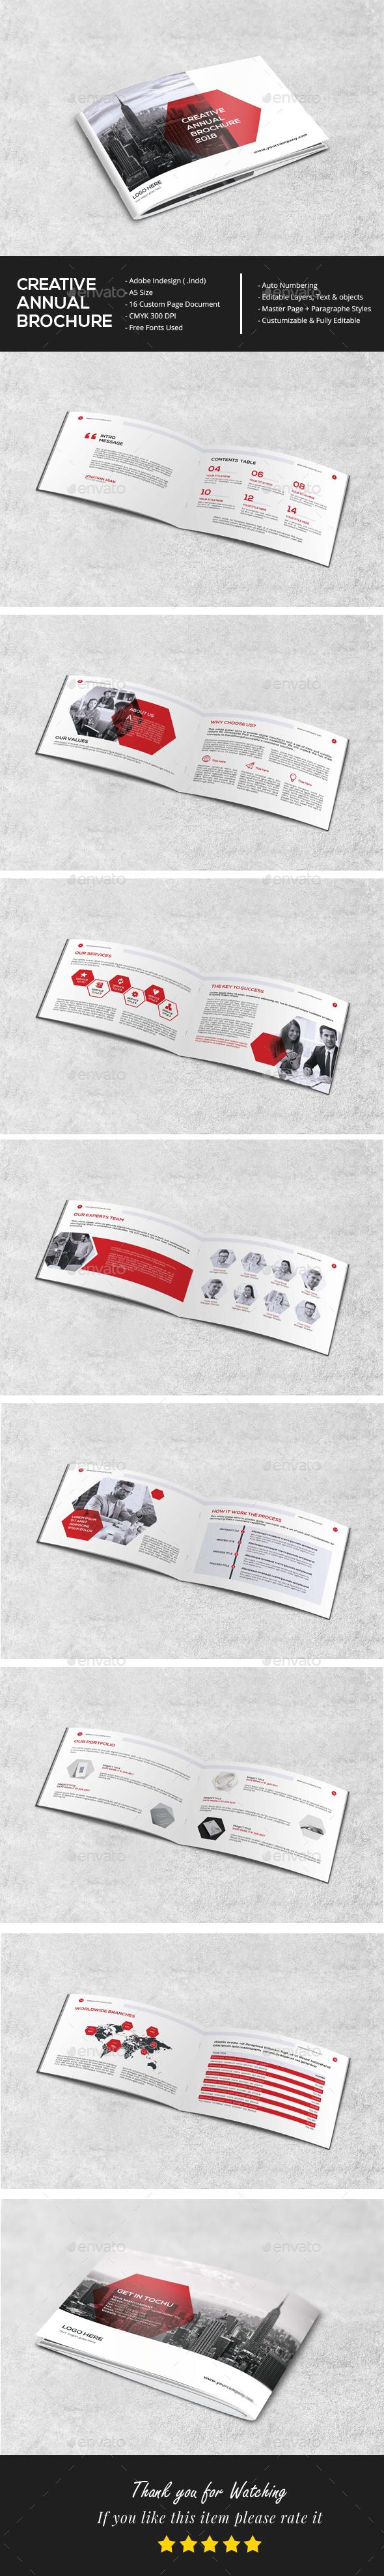 A5 Clean Annual Brochure - Brochures Print Templates